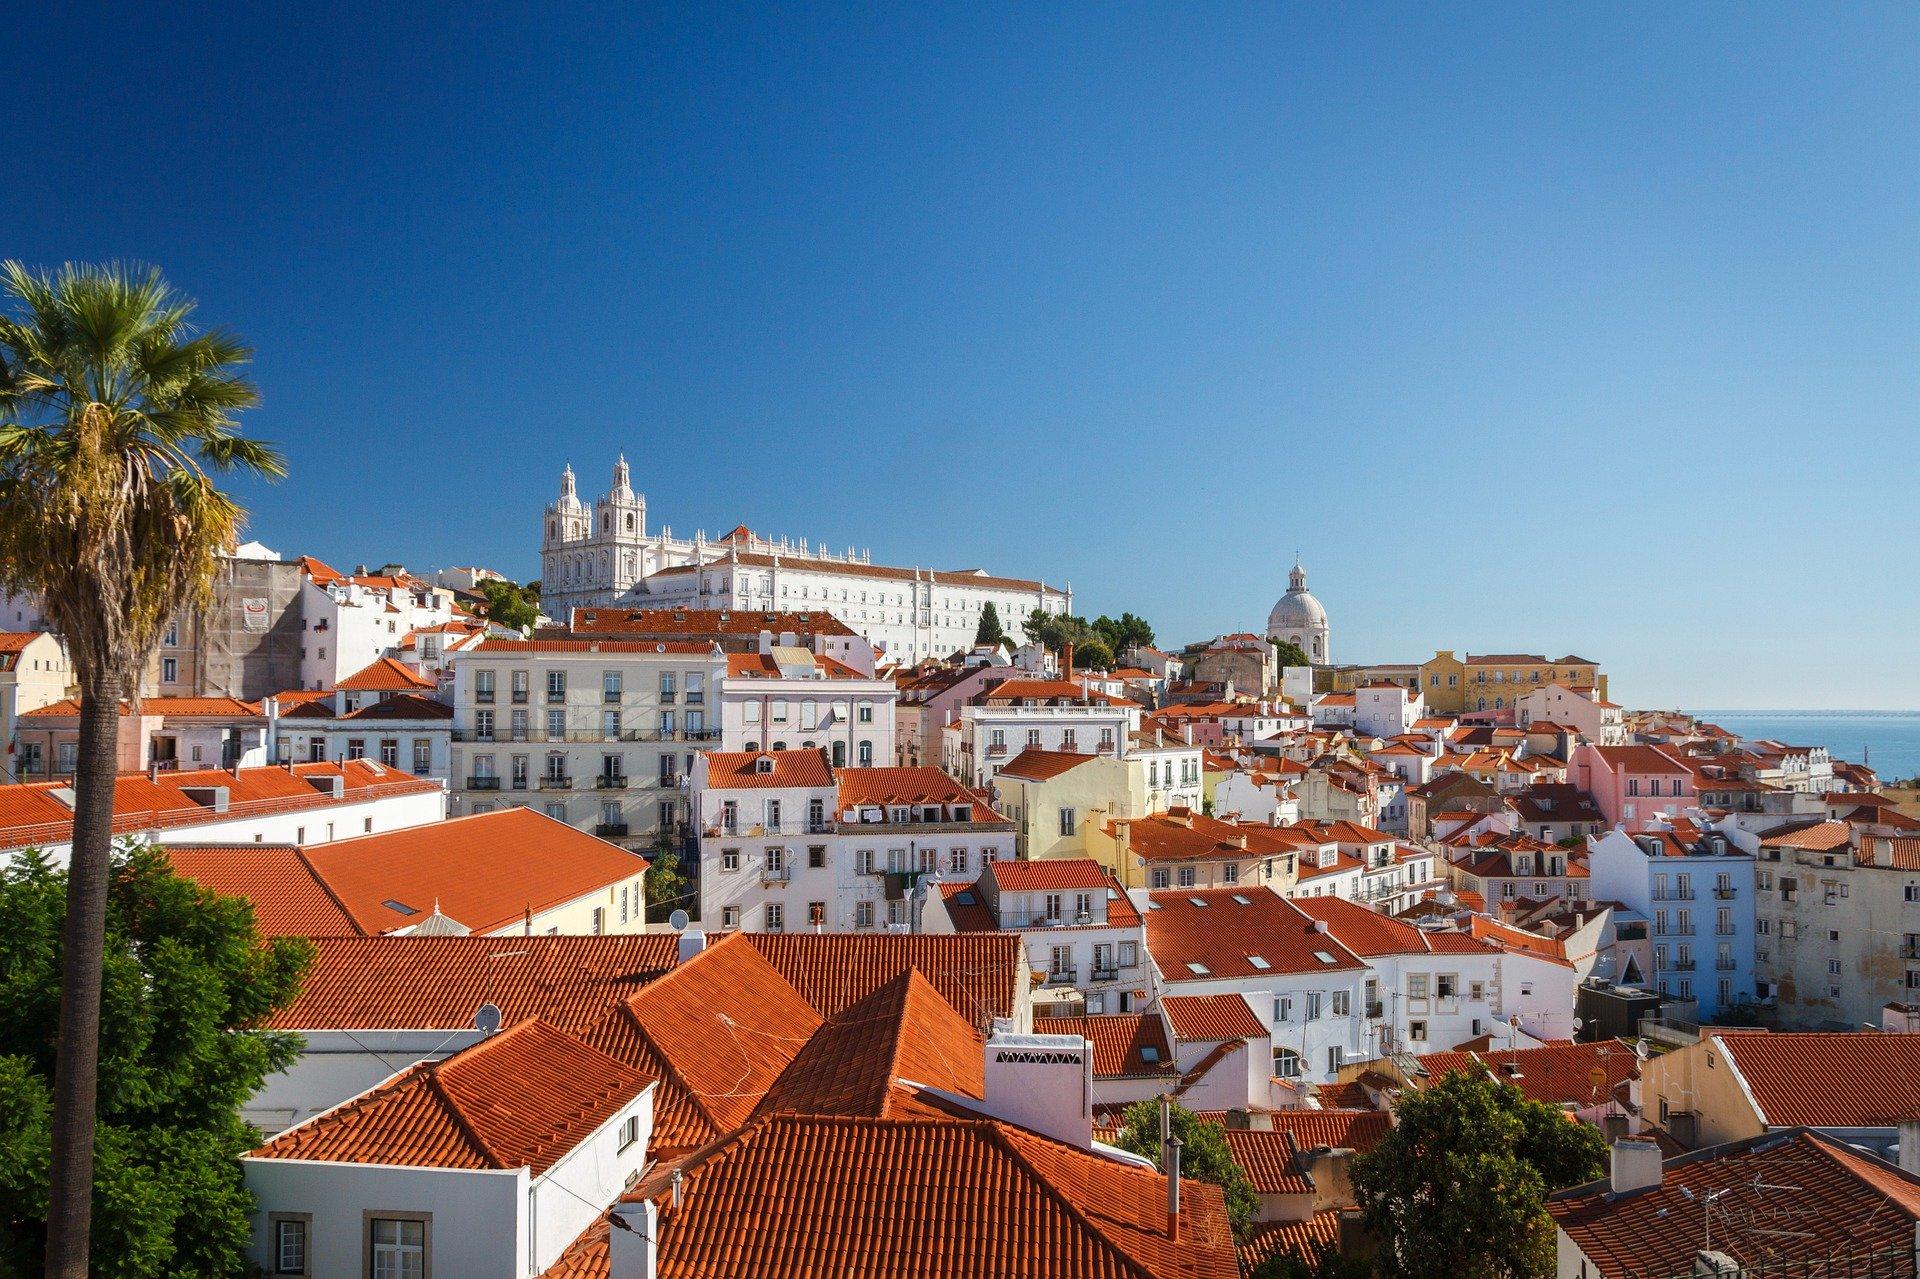 Lisboa continua a cidade mais cara para comprar casa: 3.375 euros por m2 / Imagem de Steffen Zimmermann por Pixabay